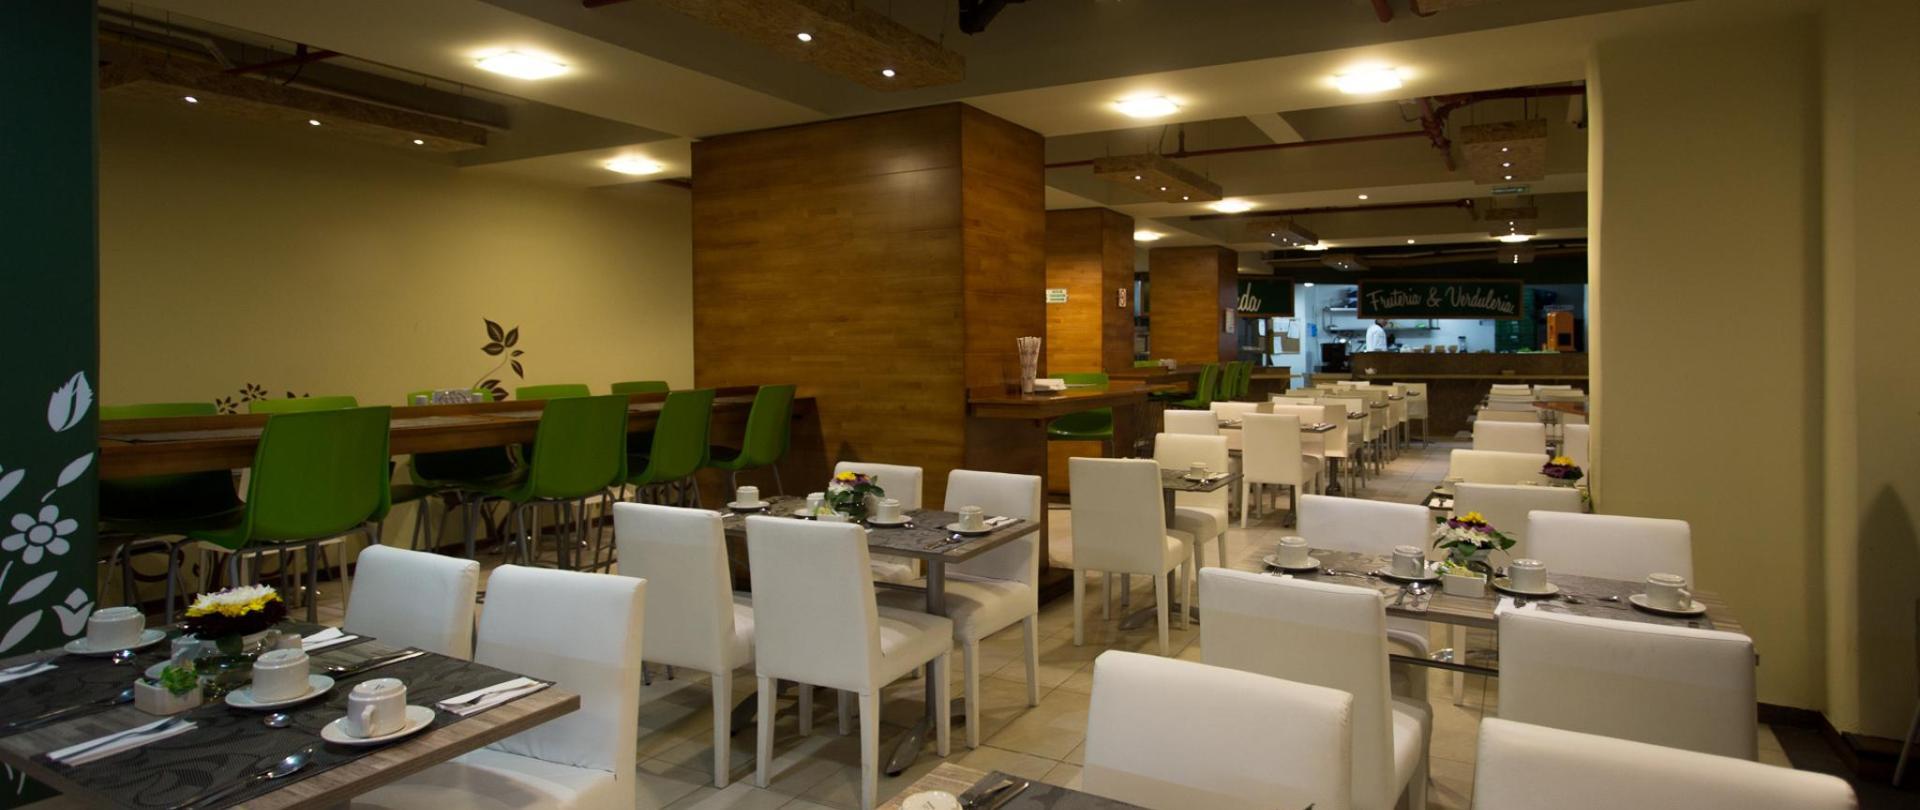 Restaurante Placita verde 2.jpg